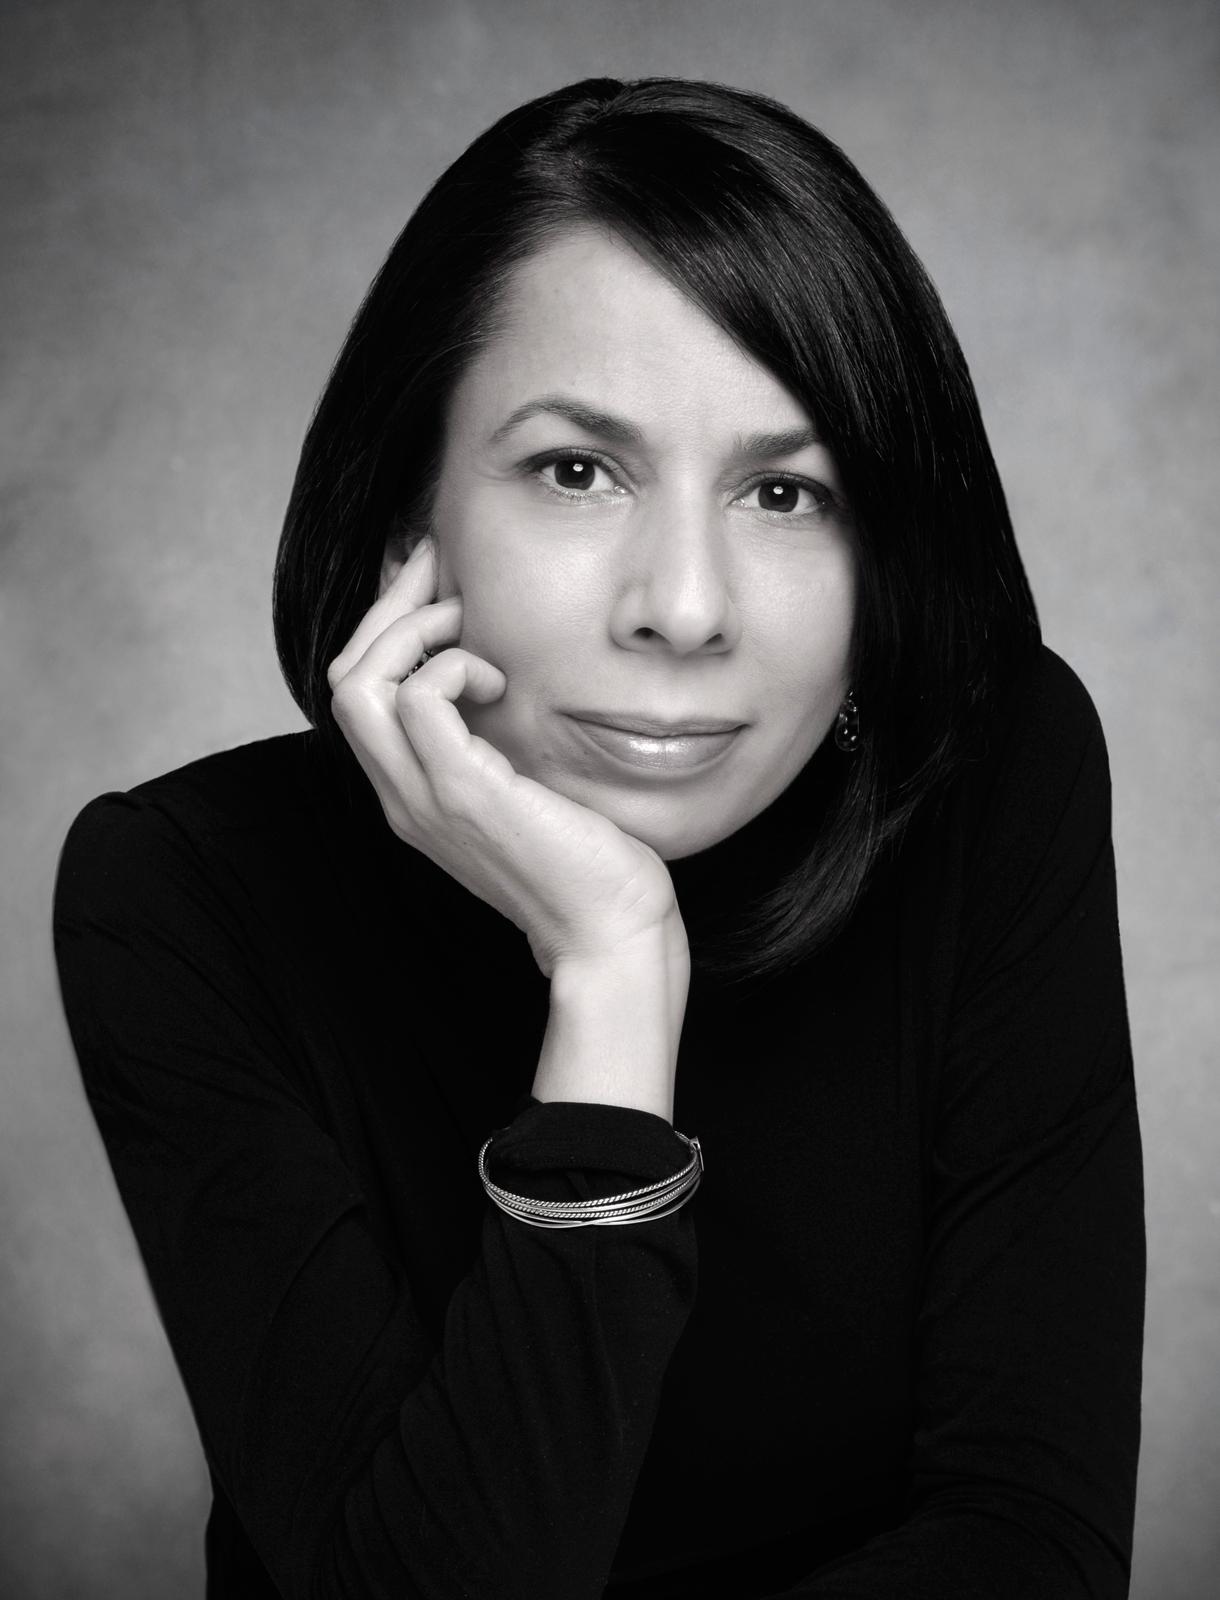 Modern textile designer Dorothy Cosonas, creative director of Knoll